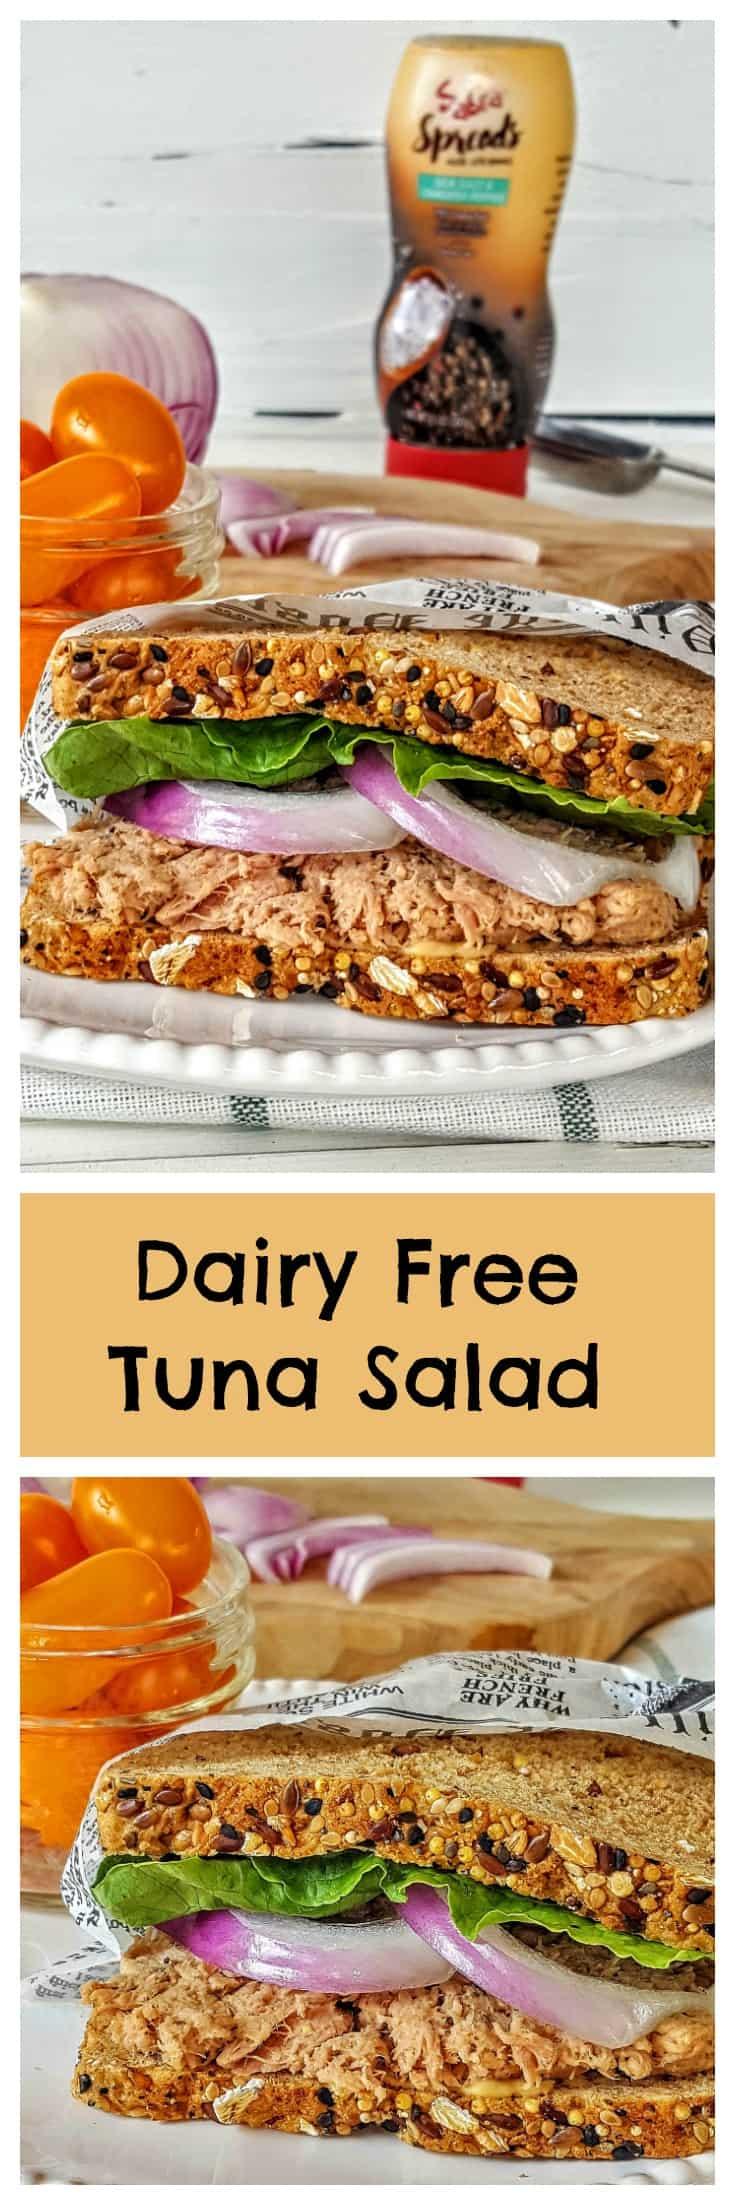 Healthy Tuna Salad @shawsimpleswaps #ad #sabraspreads